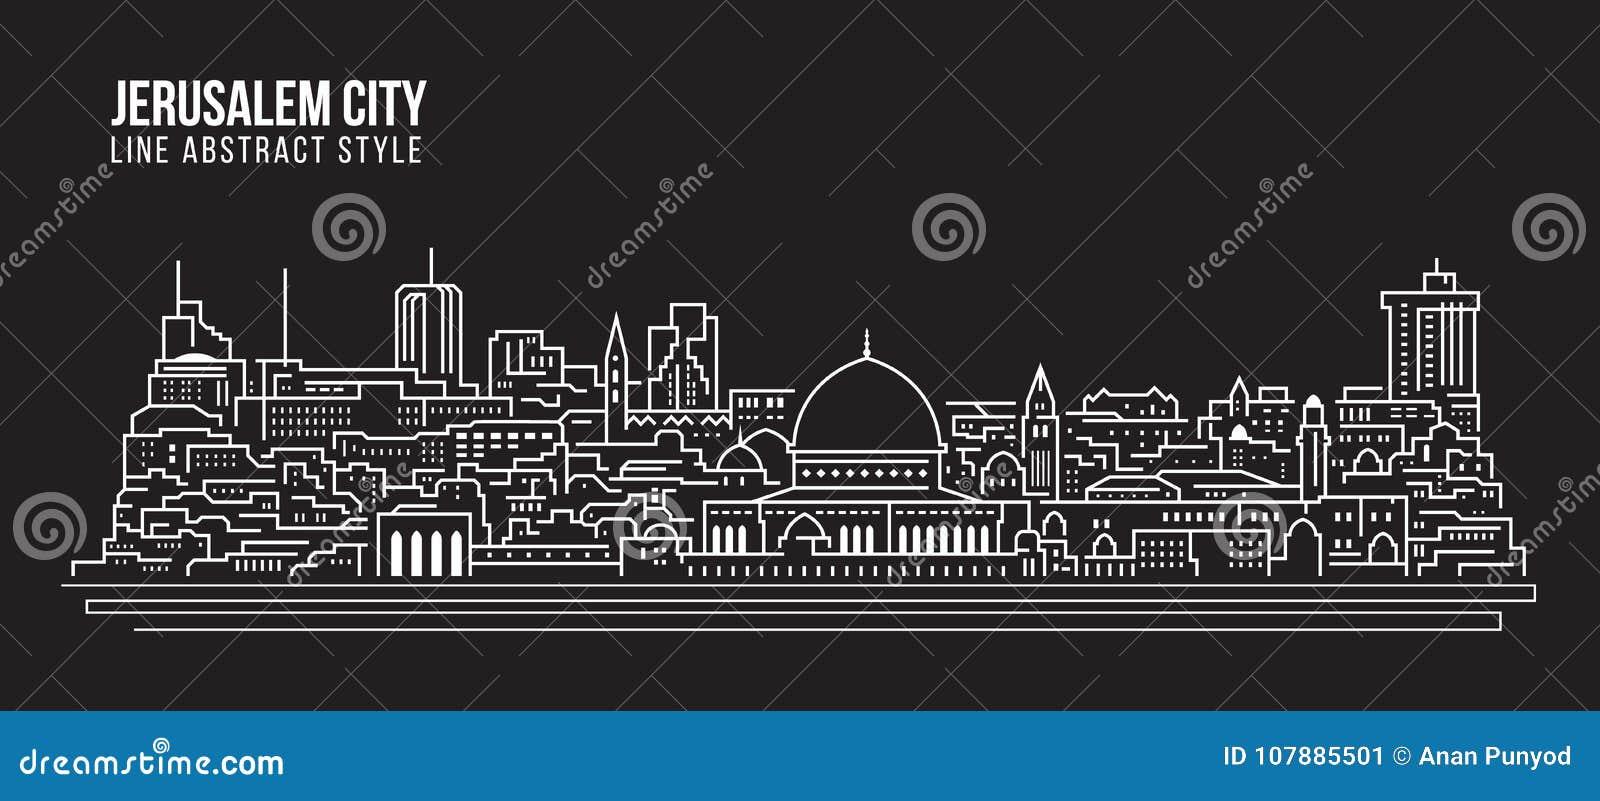 Line Drawing Jerusalem : Hadas hassid th drawing biennale jerusalem